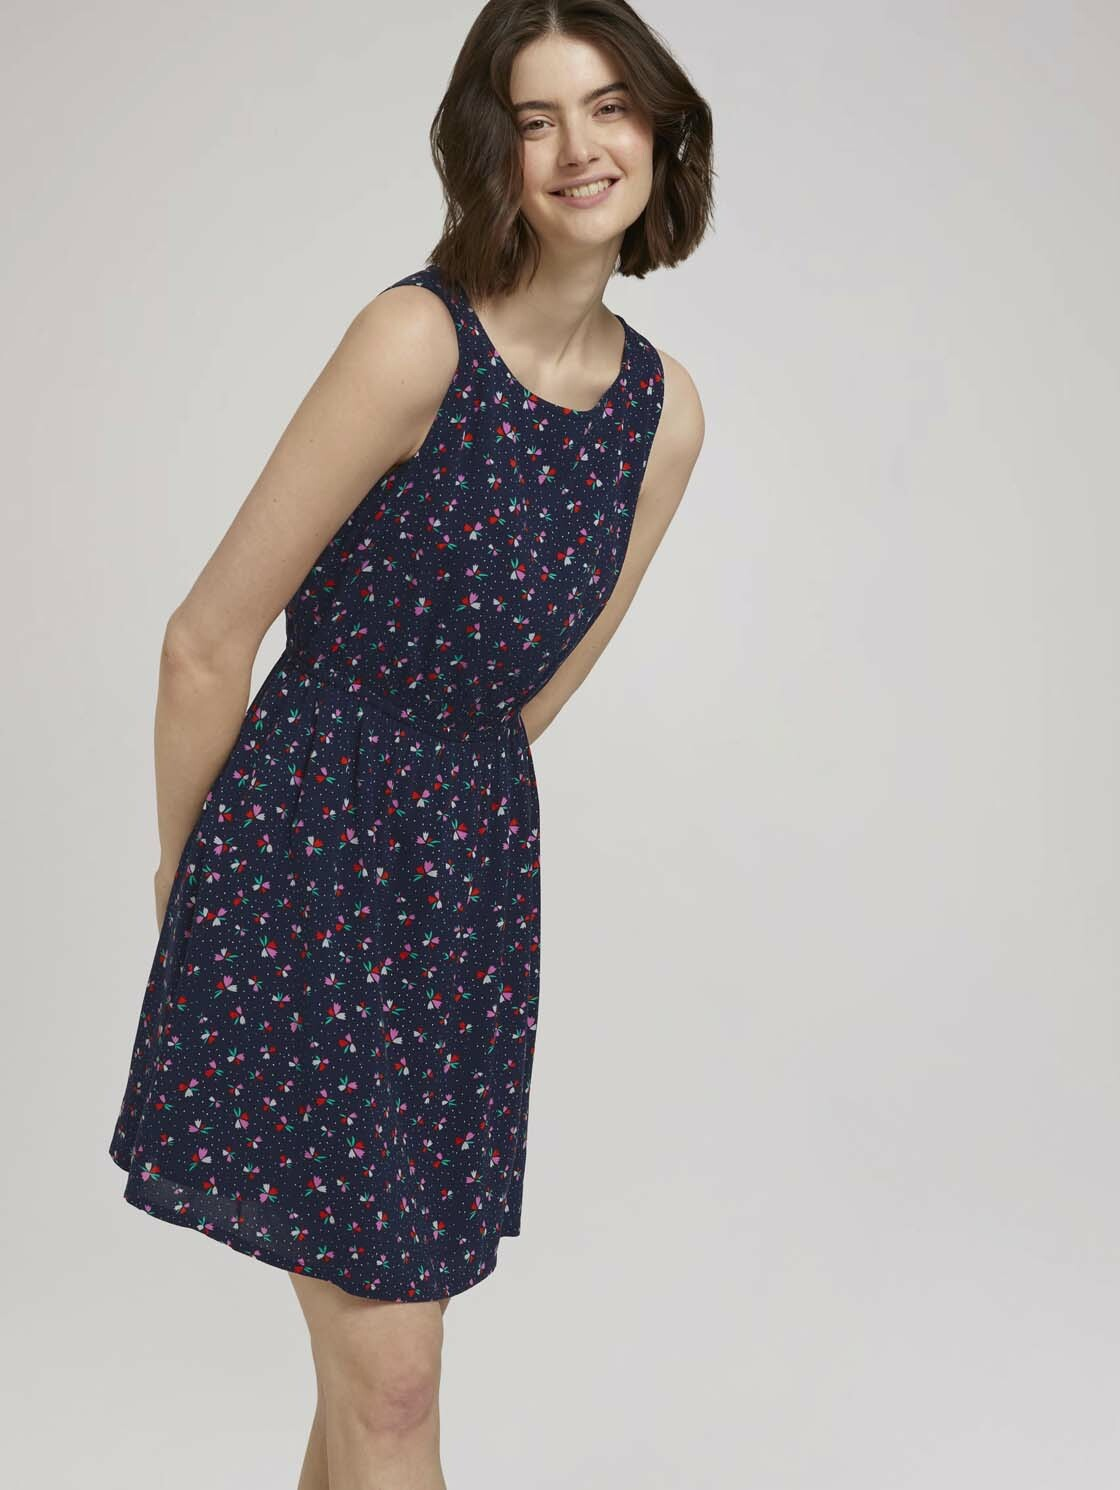 tom tailor denim -  Minikleid Ärmelloses Minikleid mit Blumenmuster